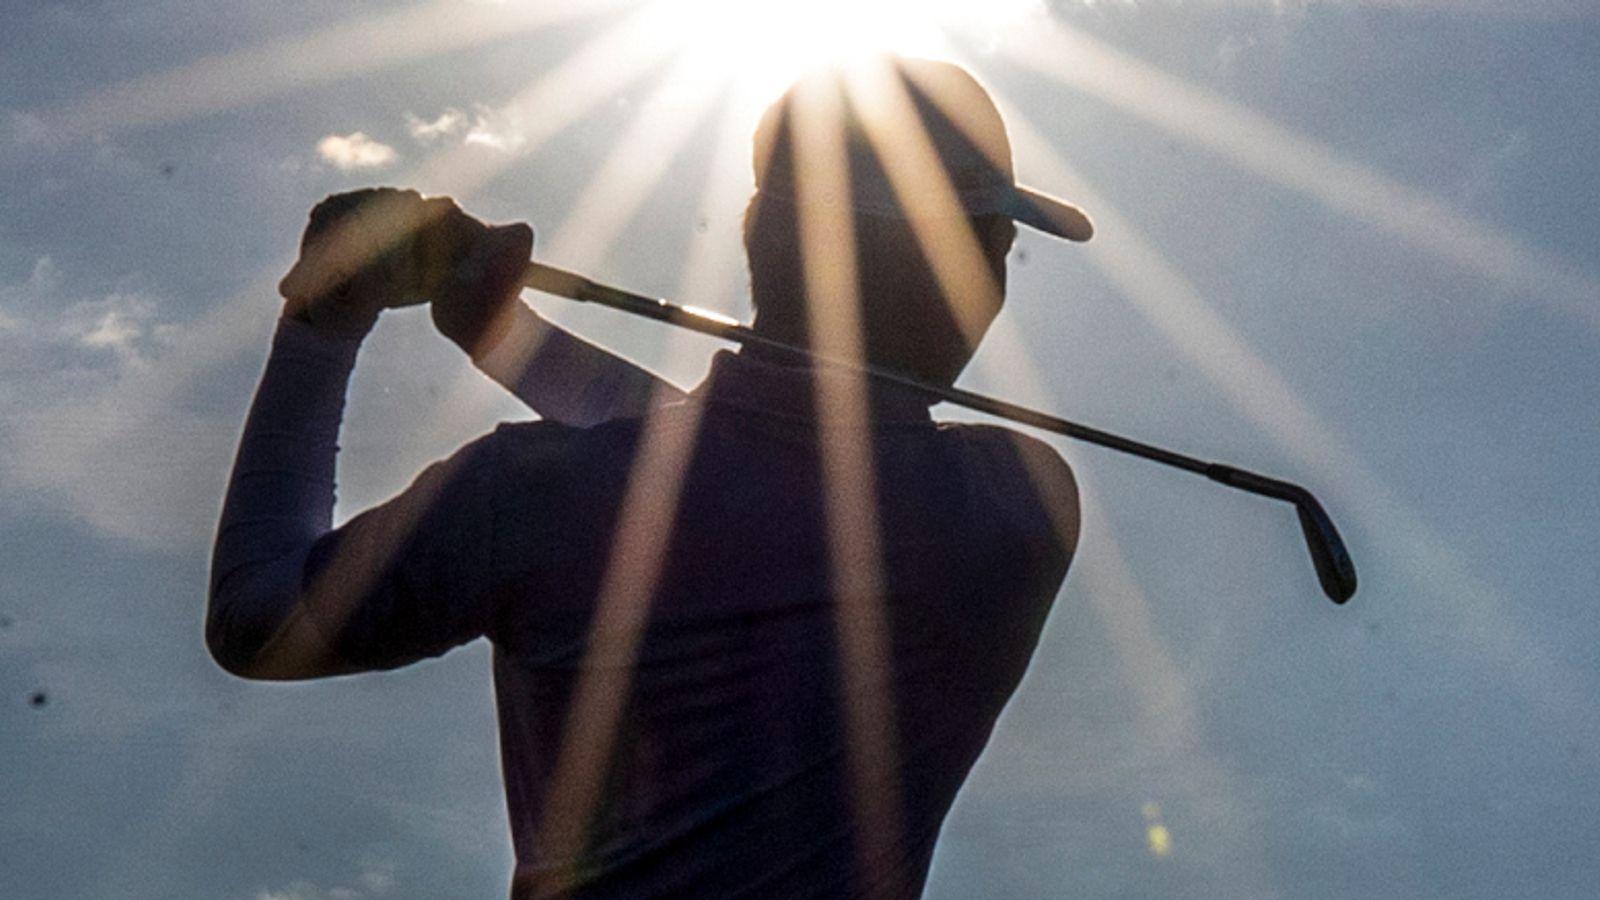 skysports-golf-general-silhouette_5281485.jpg